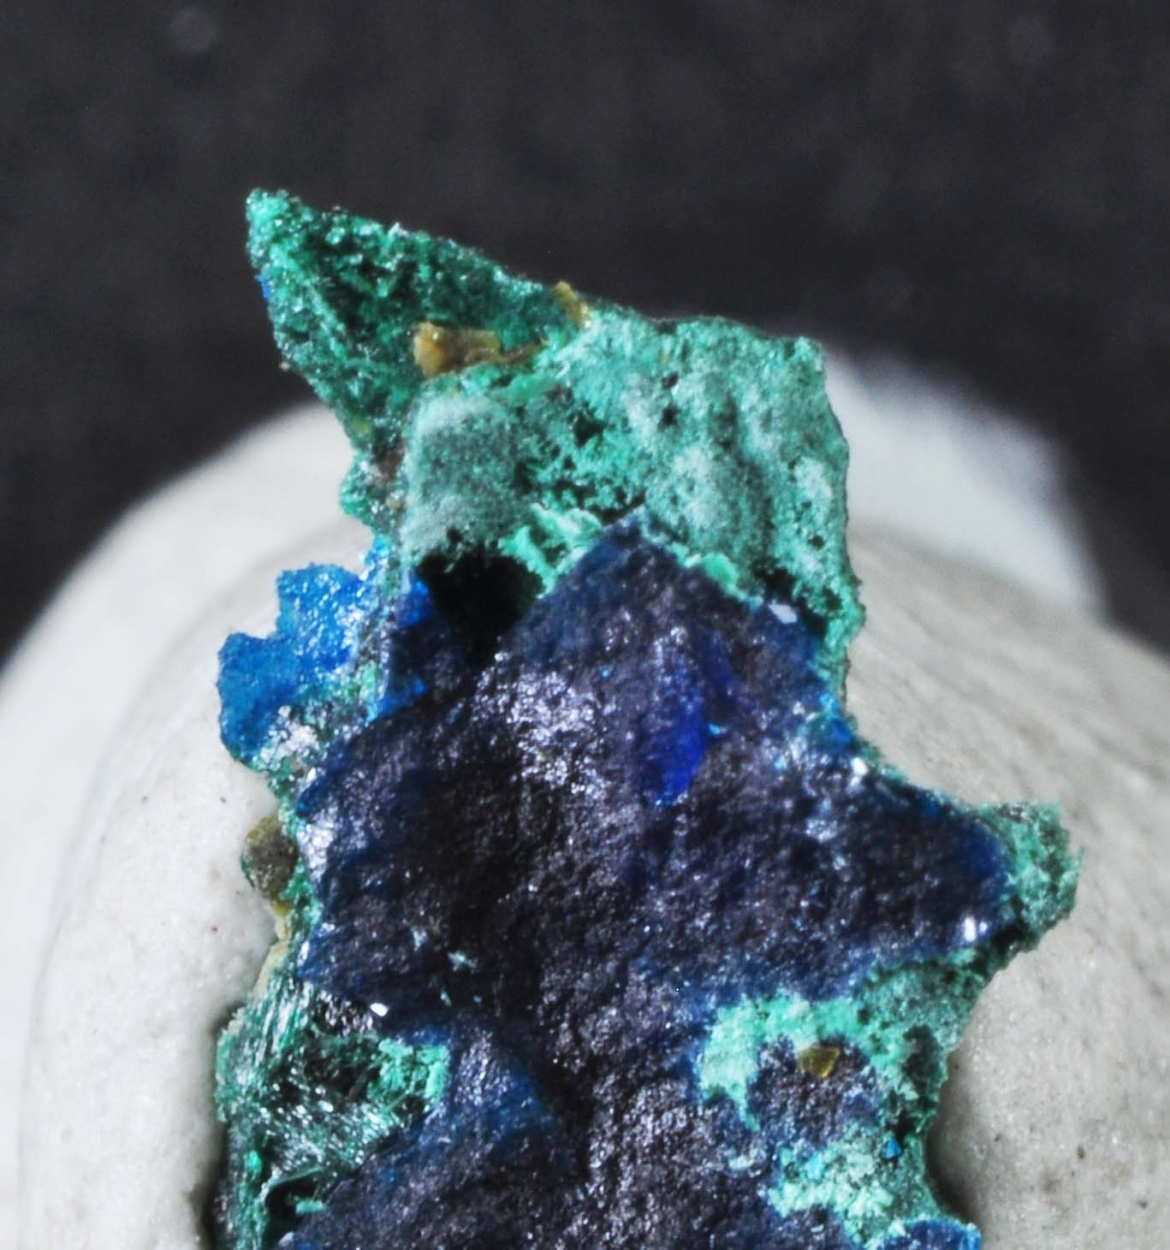 Gold & Percylite & Brochantite